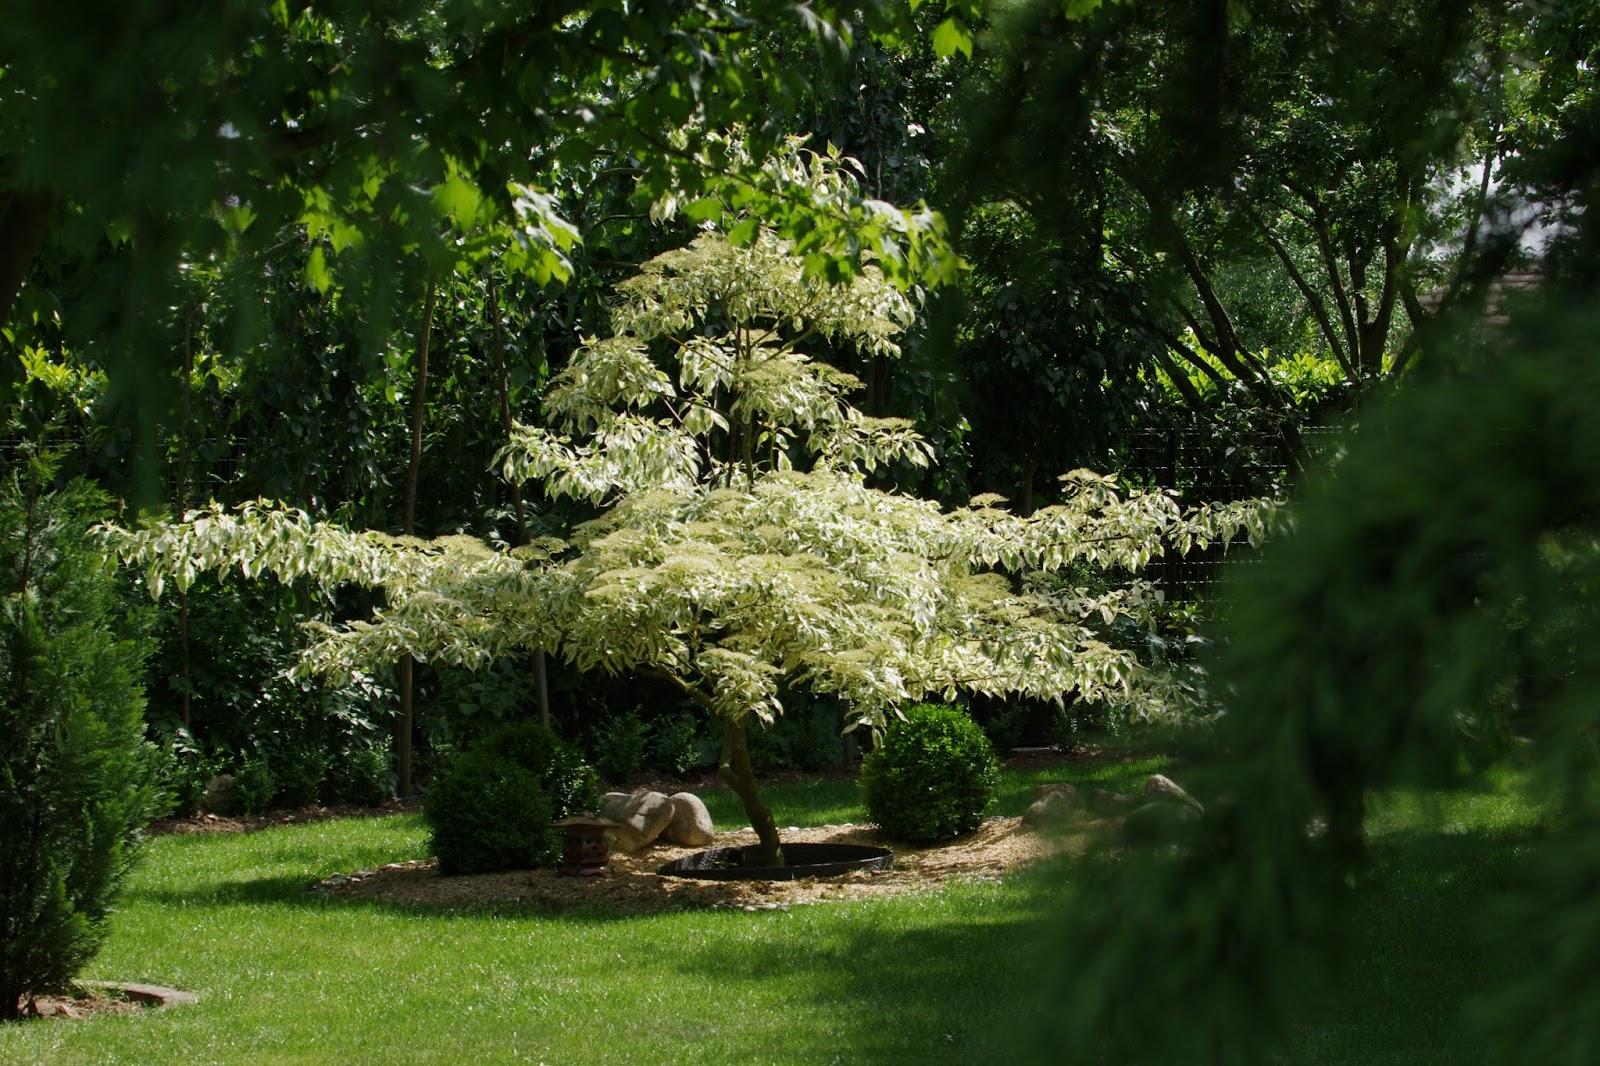 Arbre de jardin a croissance rapide le nyssa sylvatica for Arbres de jardin